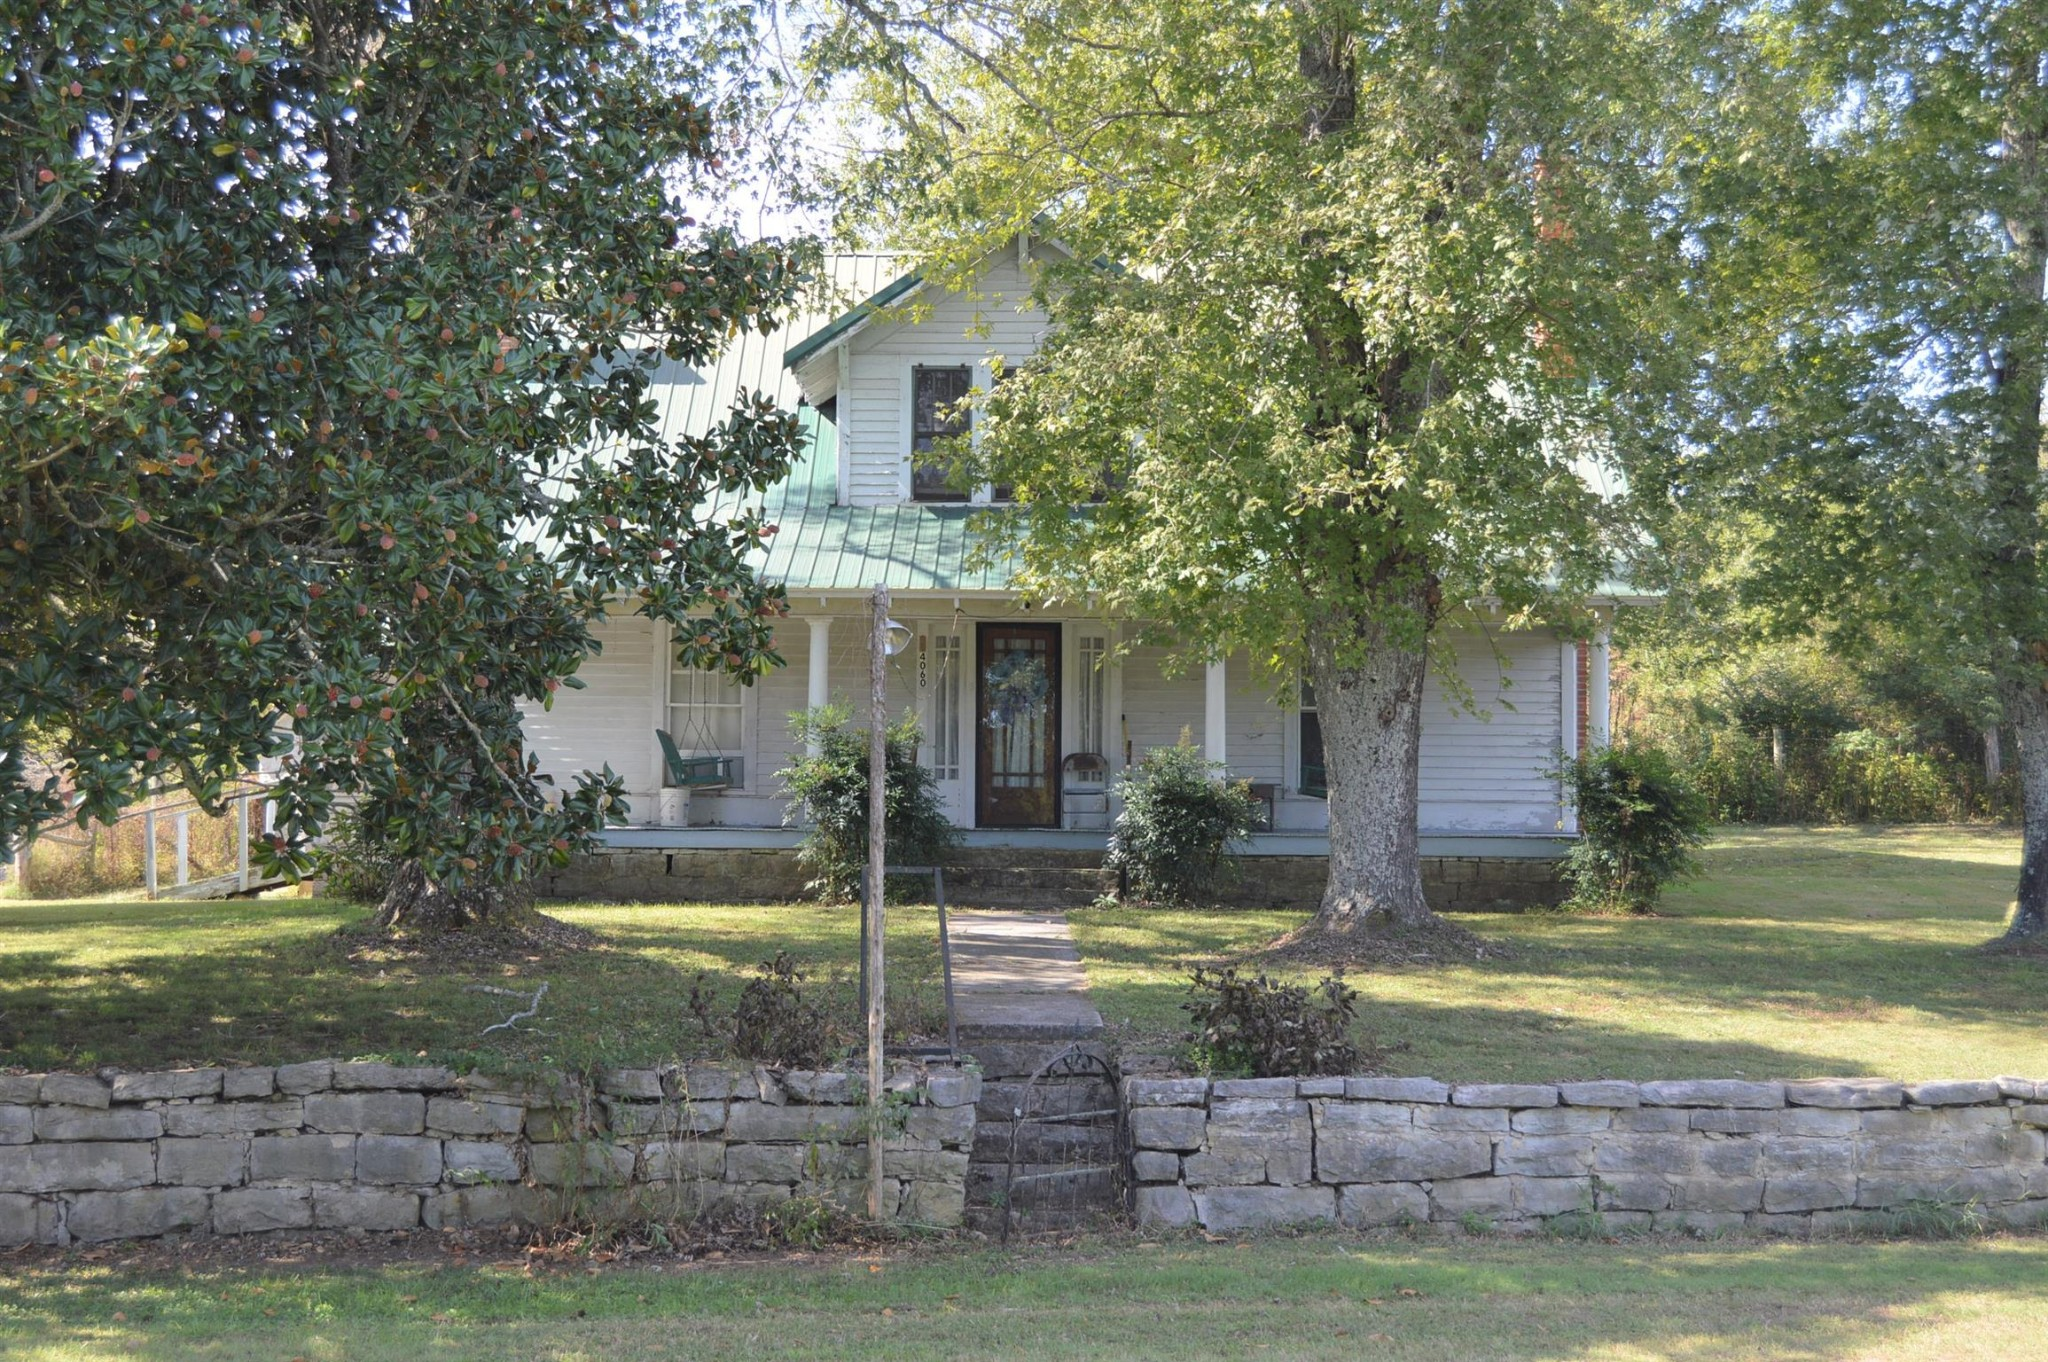 4060 John Barnes Rd, Cornersville, TN 37047 - Cornersville, TN real estate listing